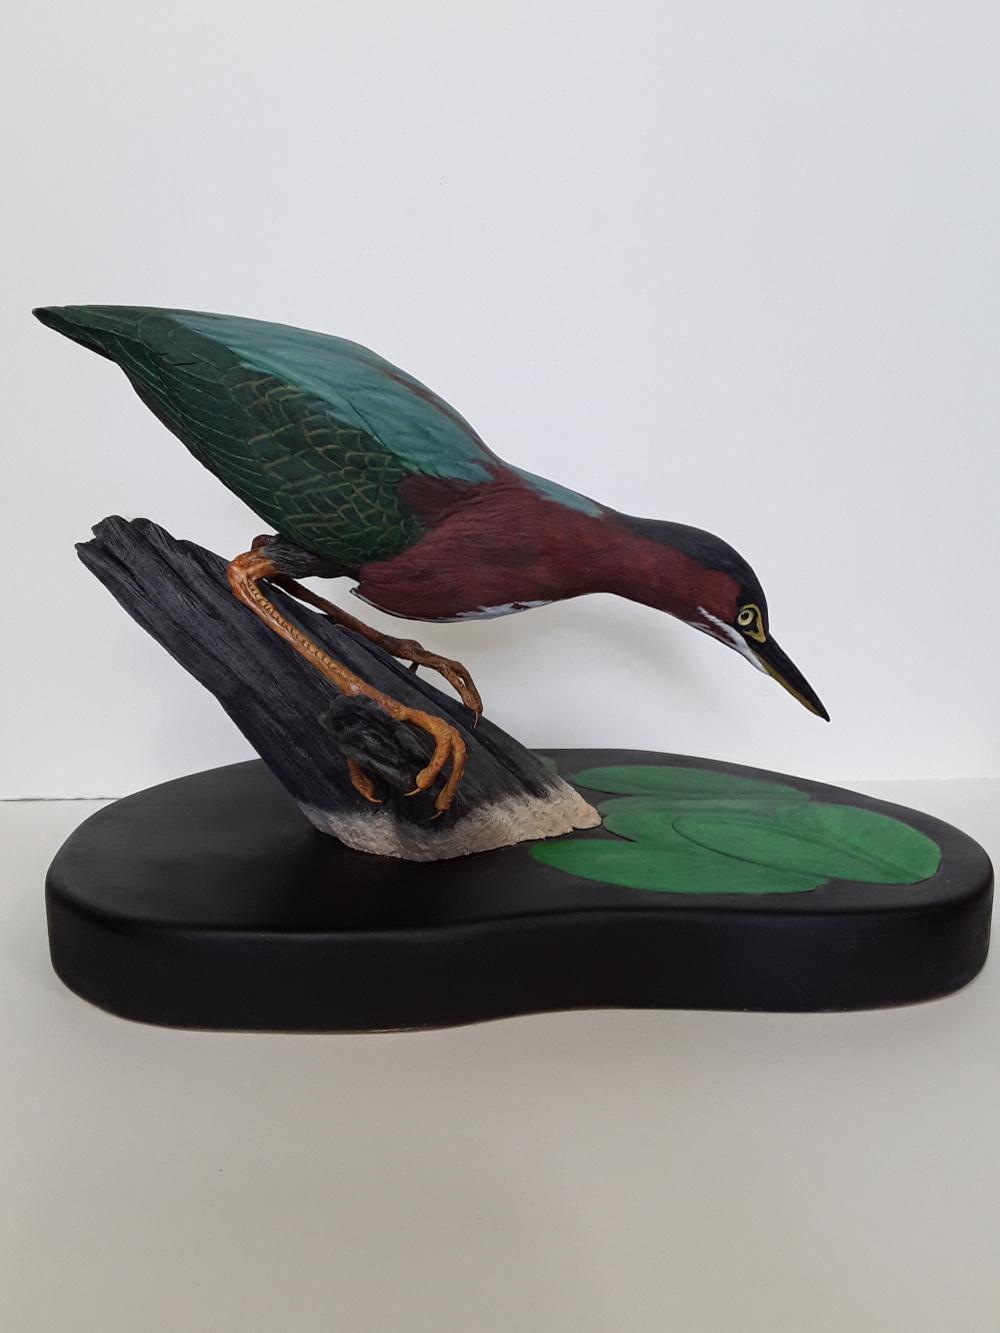 Tony Bendig's Green Herron Carving